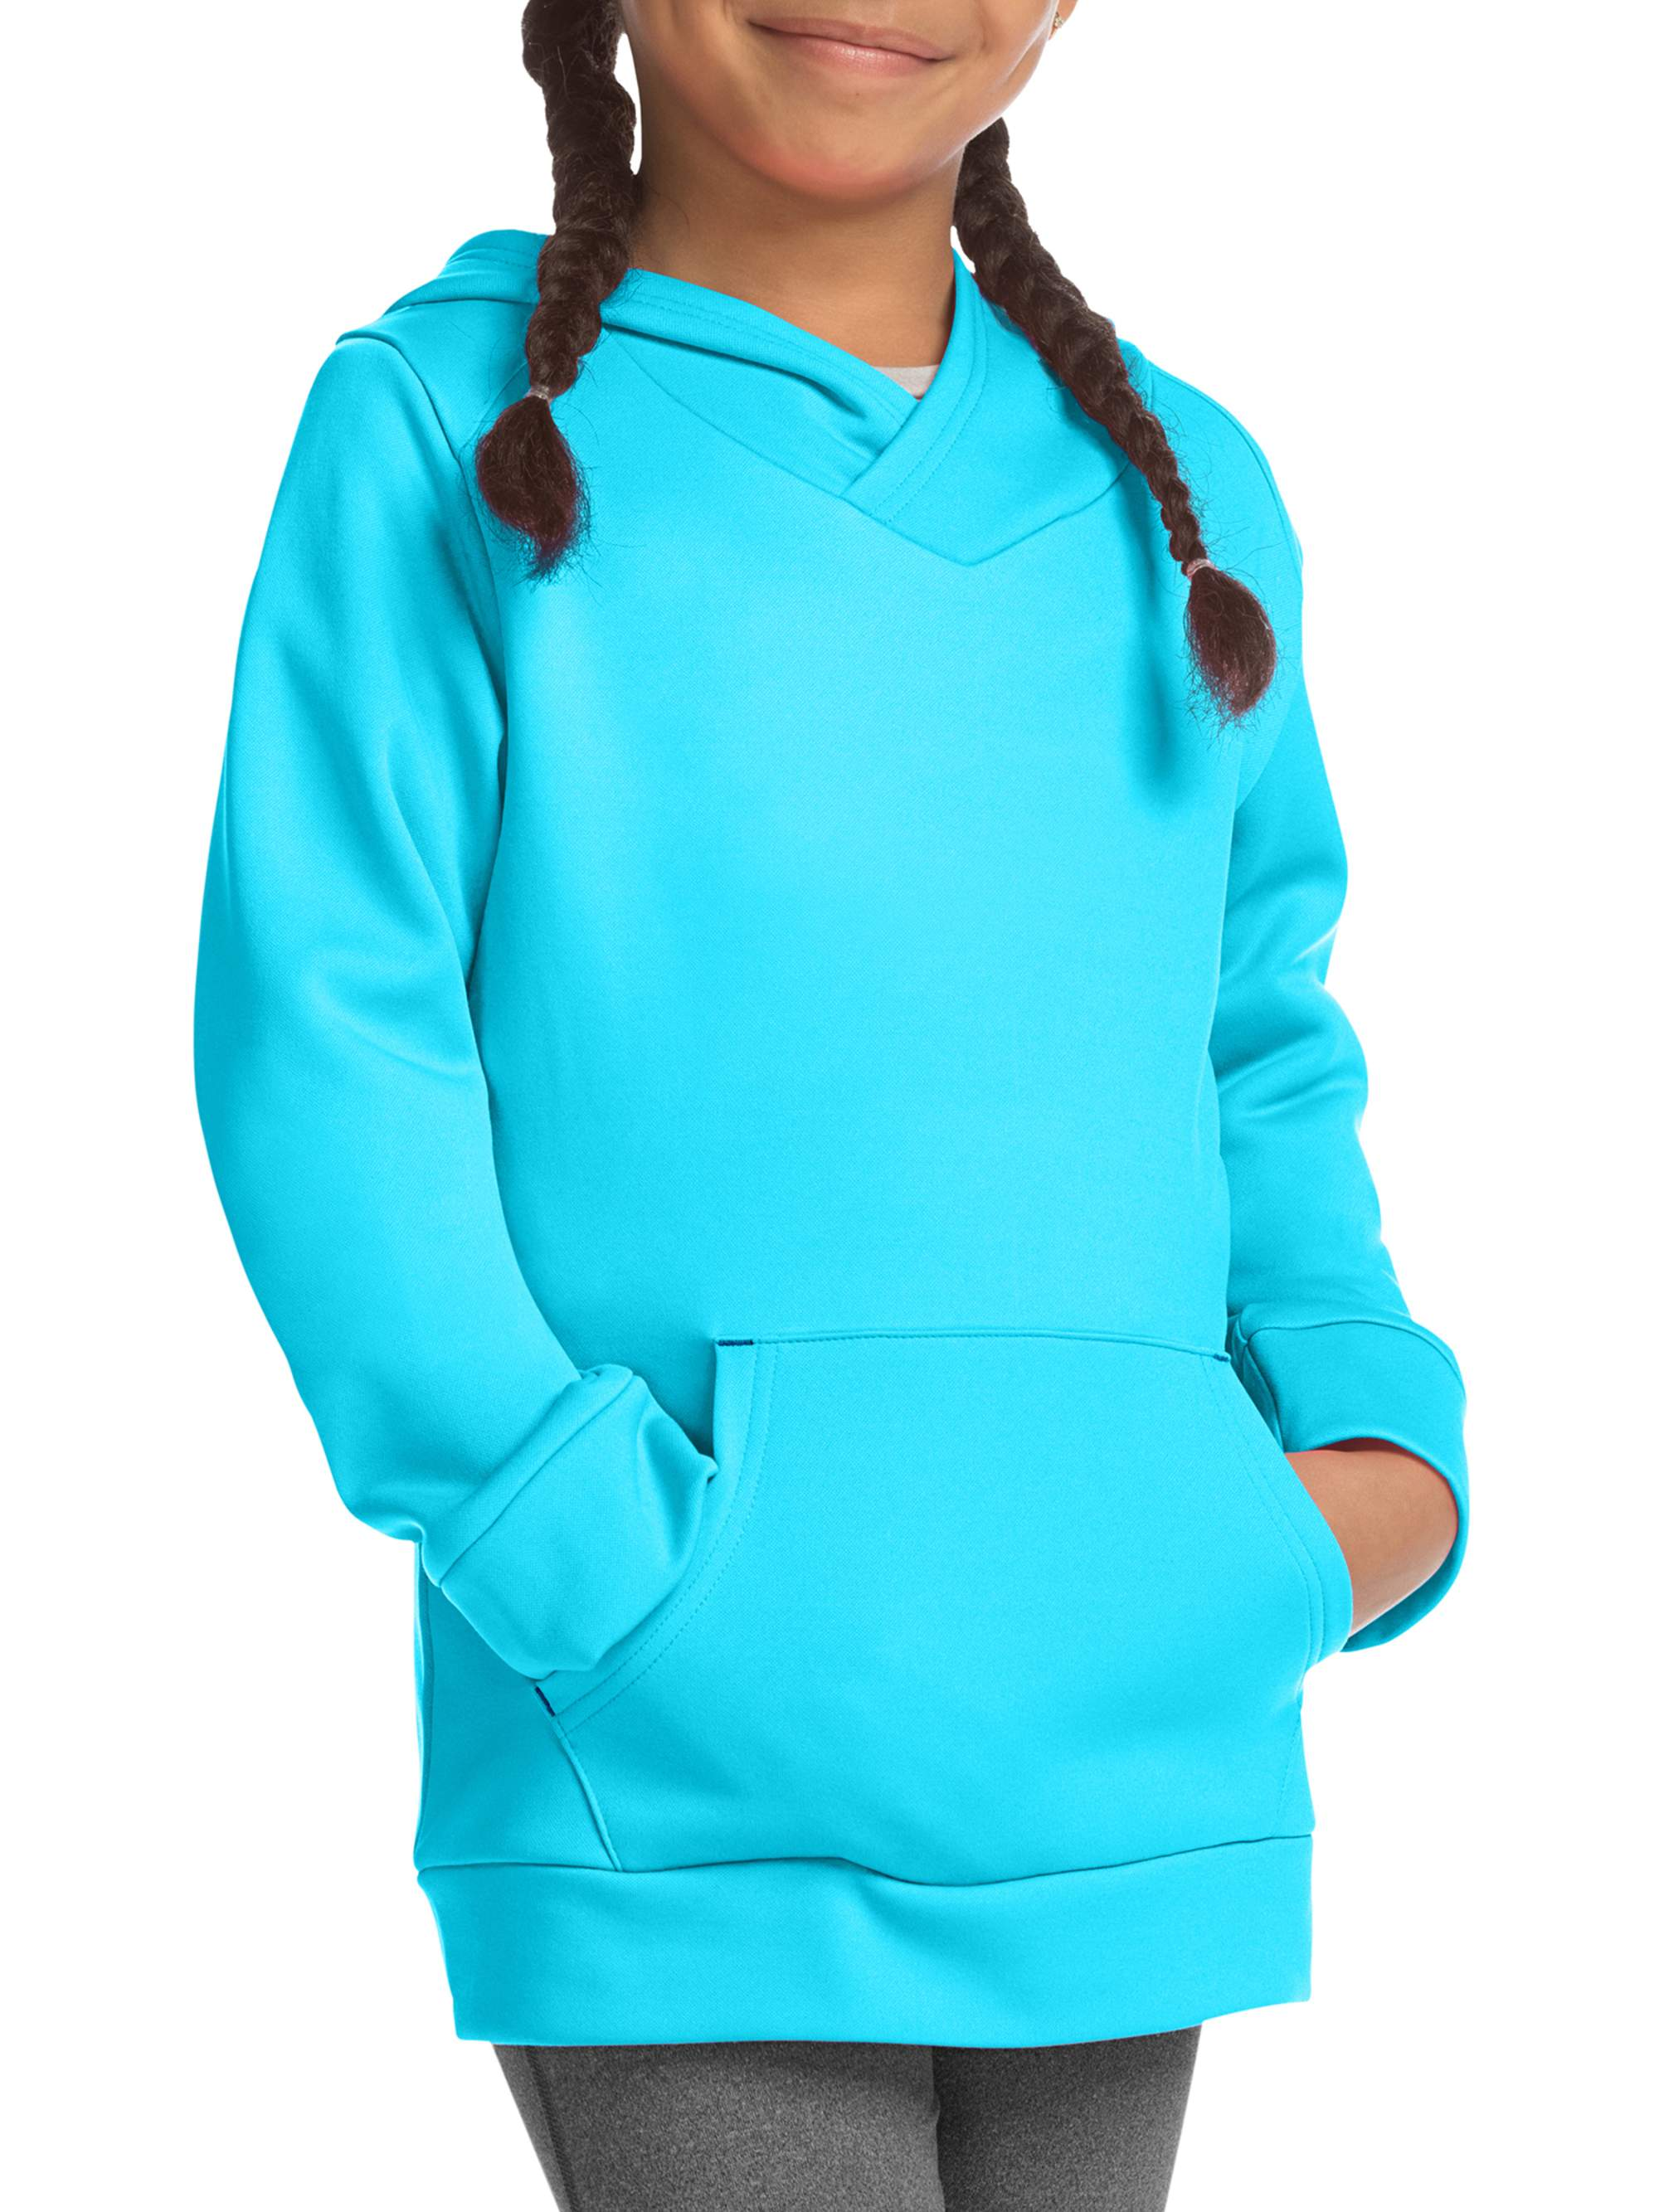 Girls' Tech Fleece Raglan Hoodie